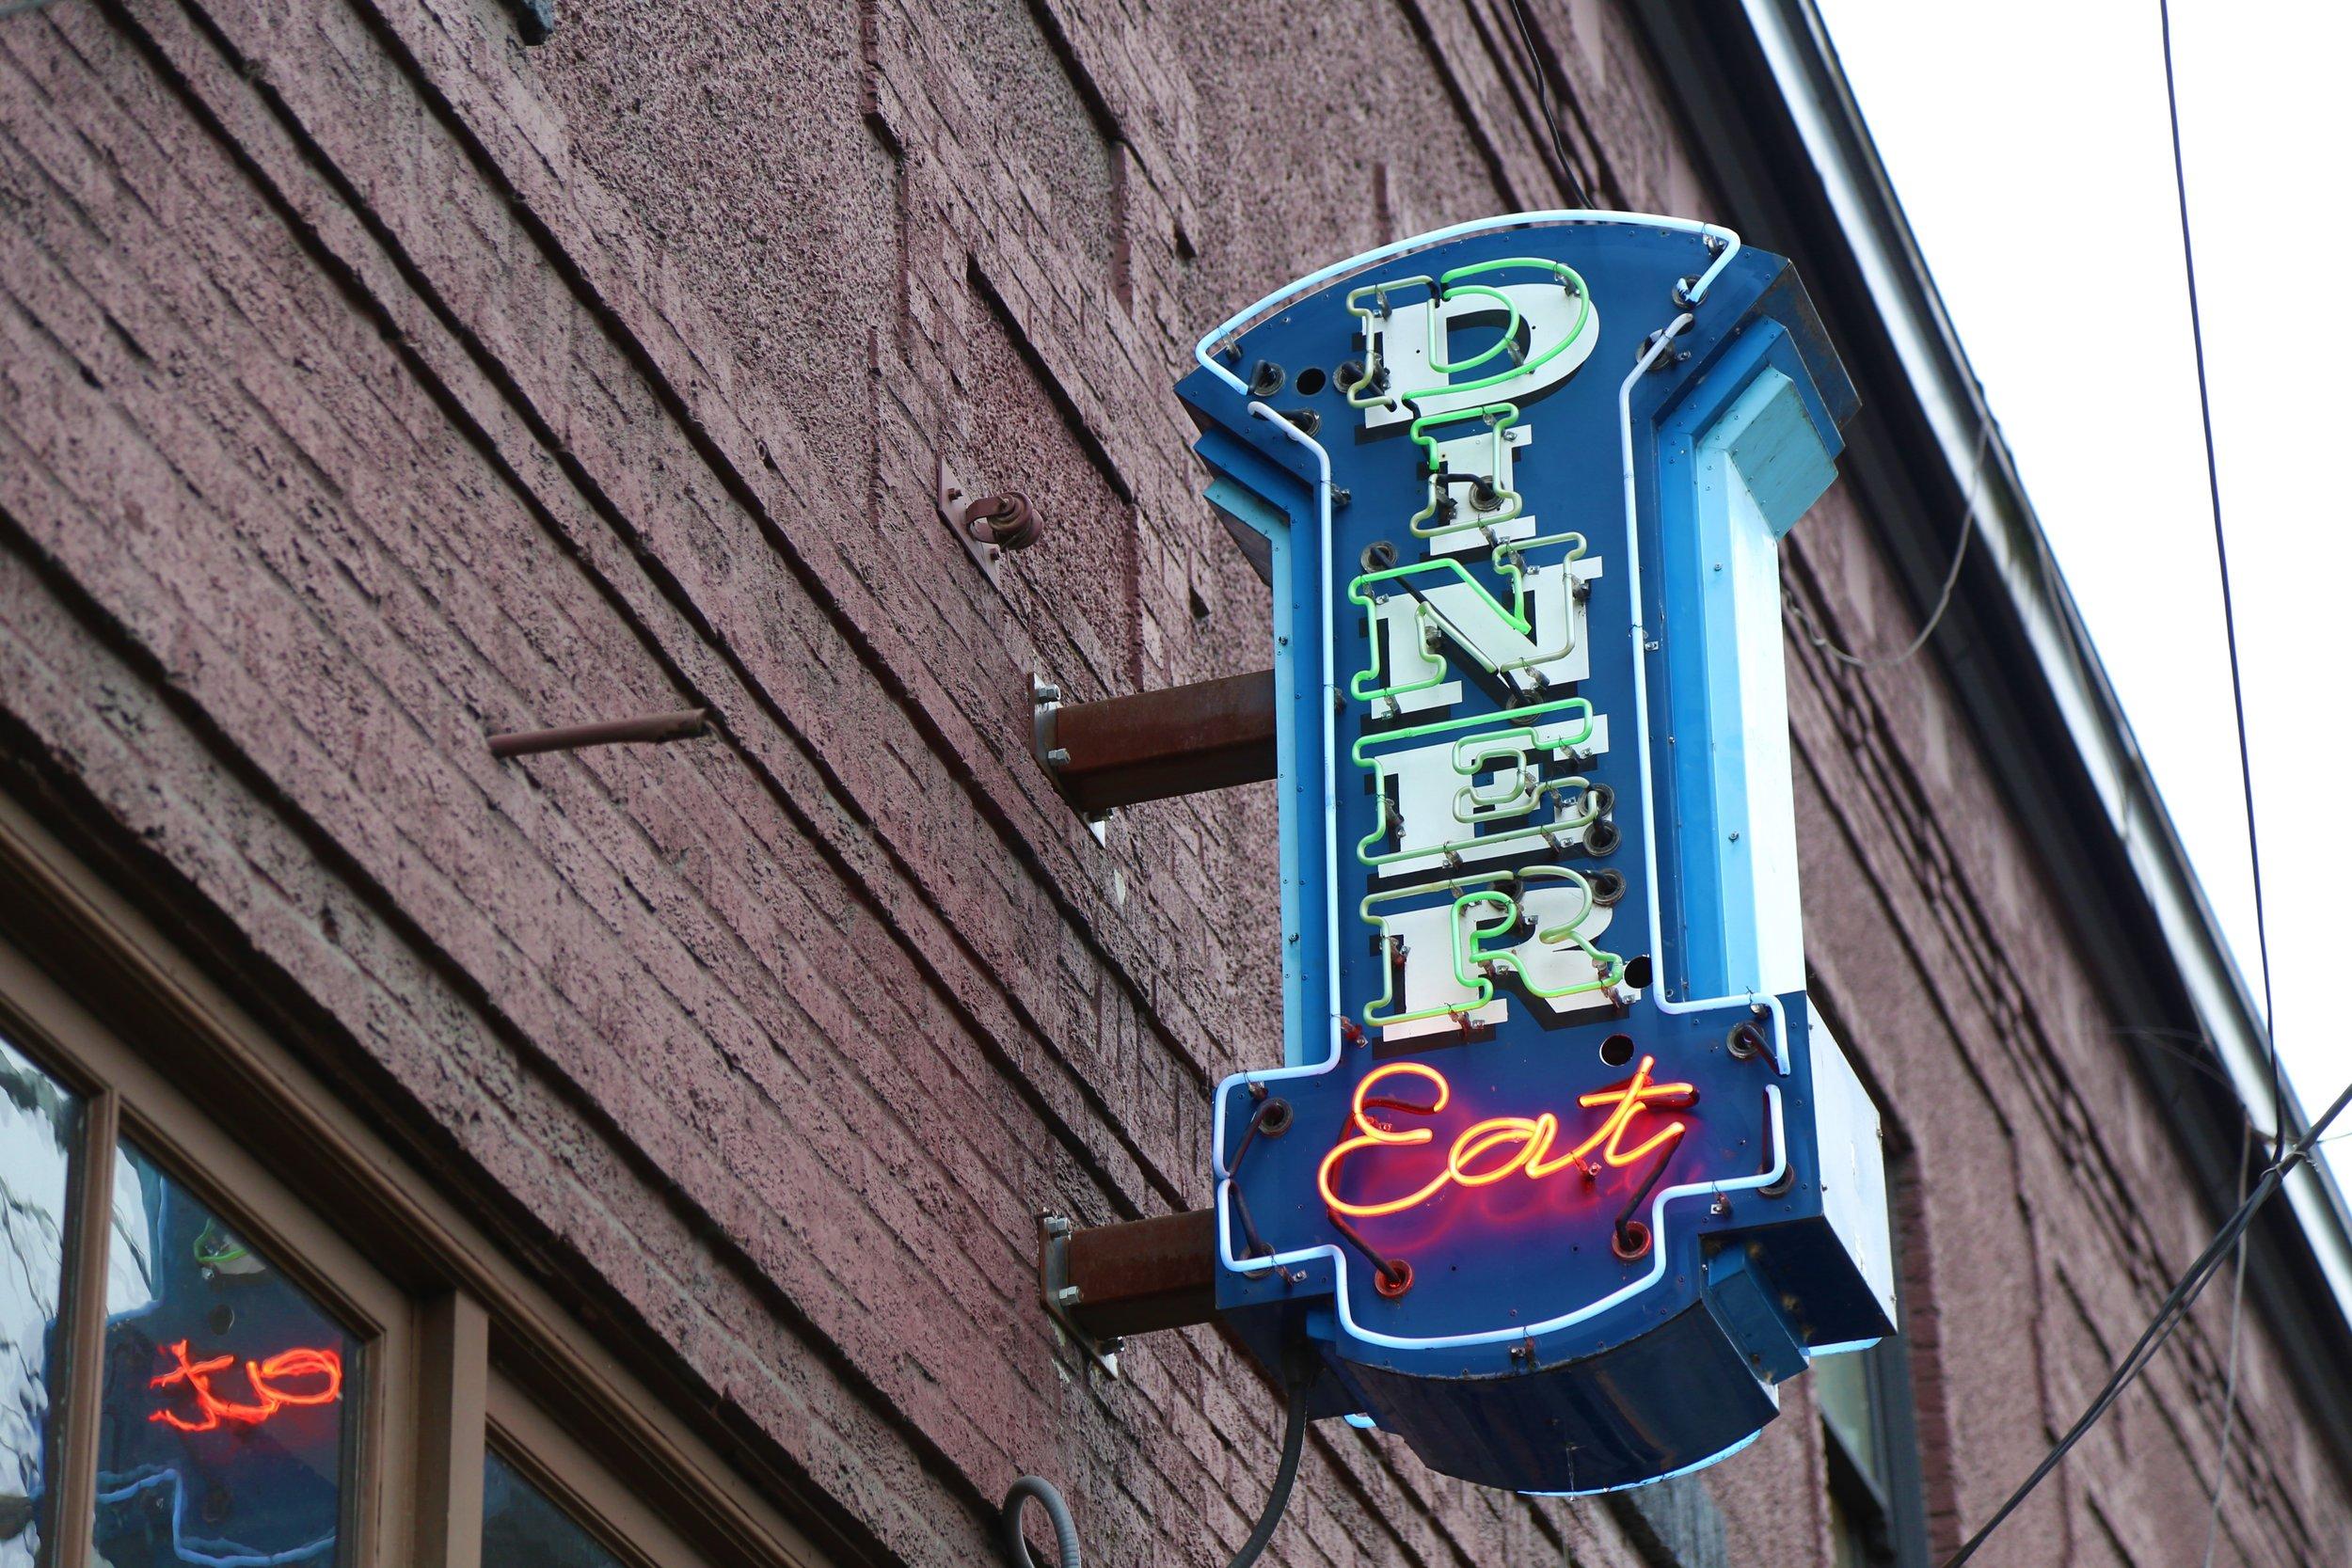 Square Knot Diner